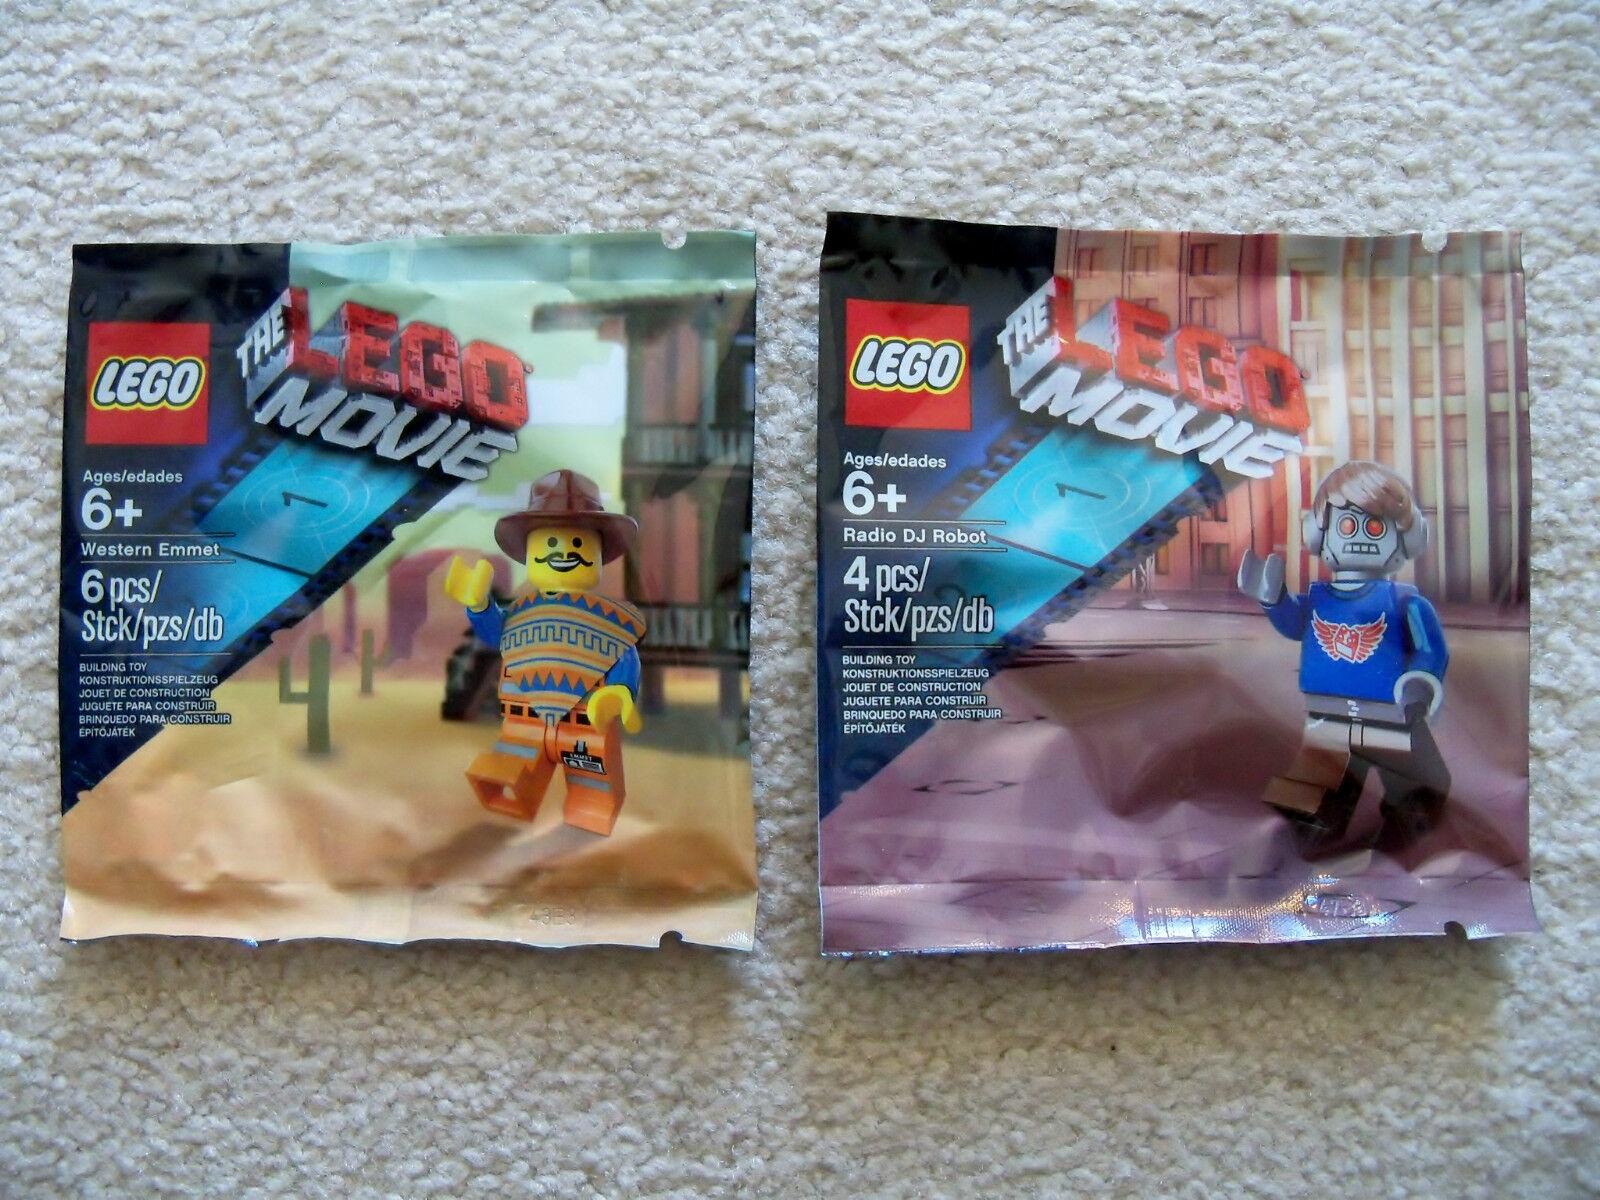 LEGO The The The LEGO Movie - Rare Radio DJ Robot 5002203 & Western Emmet 5002204 - New 793cc4